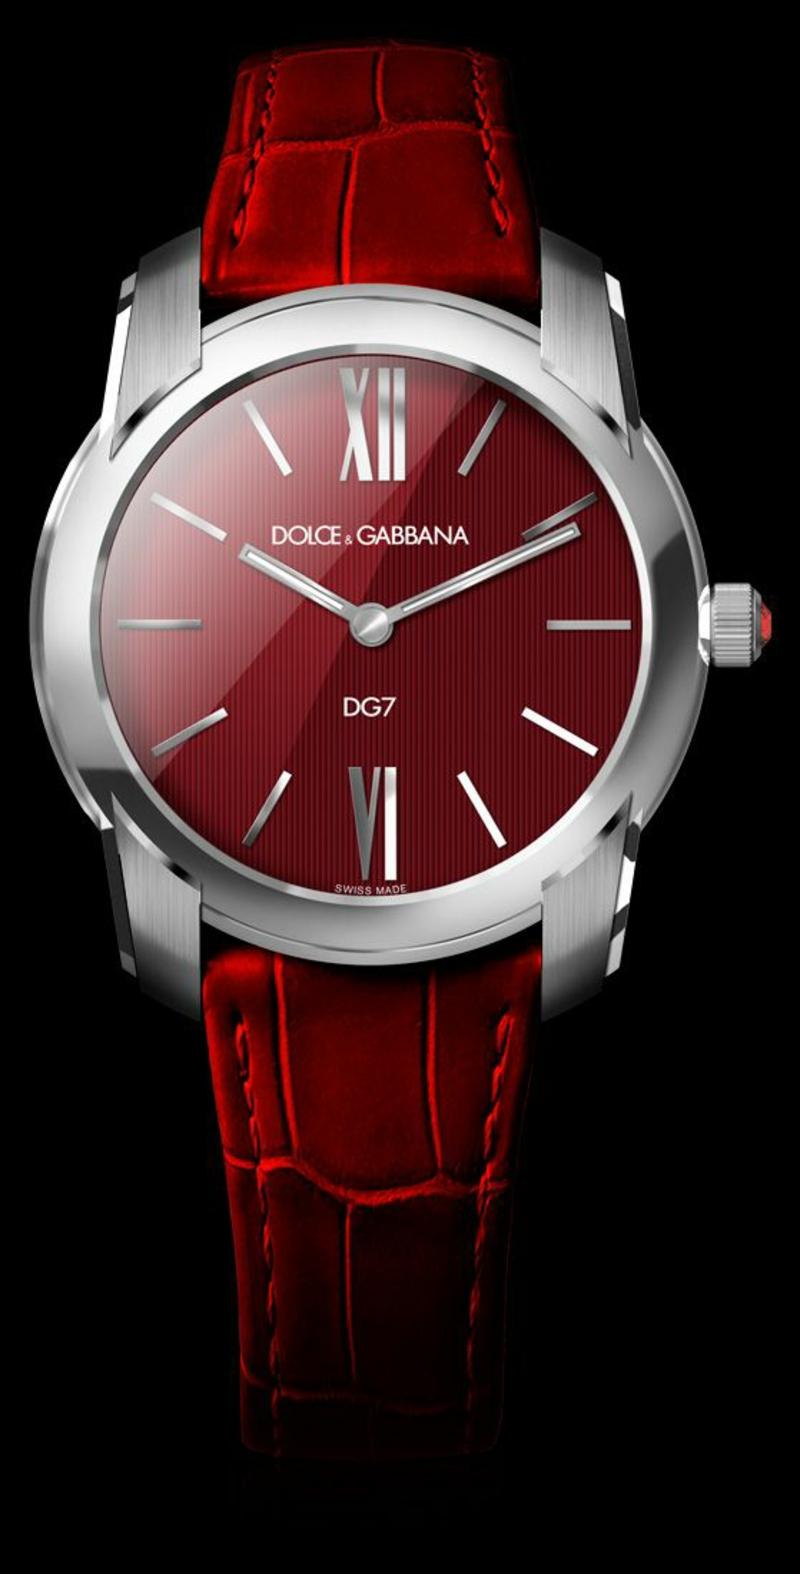 Dolce&Gabbana Damenuhren Design Leder Armbanduhr Damen rot